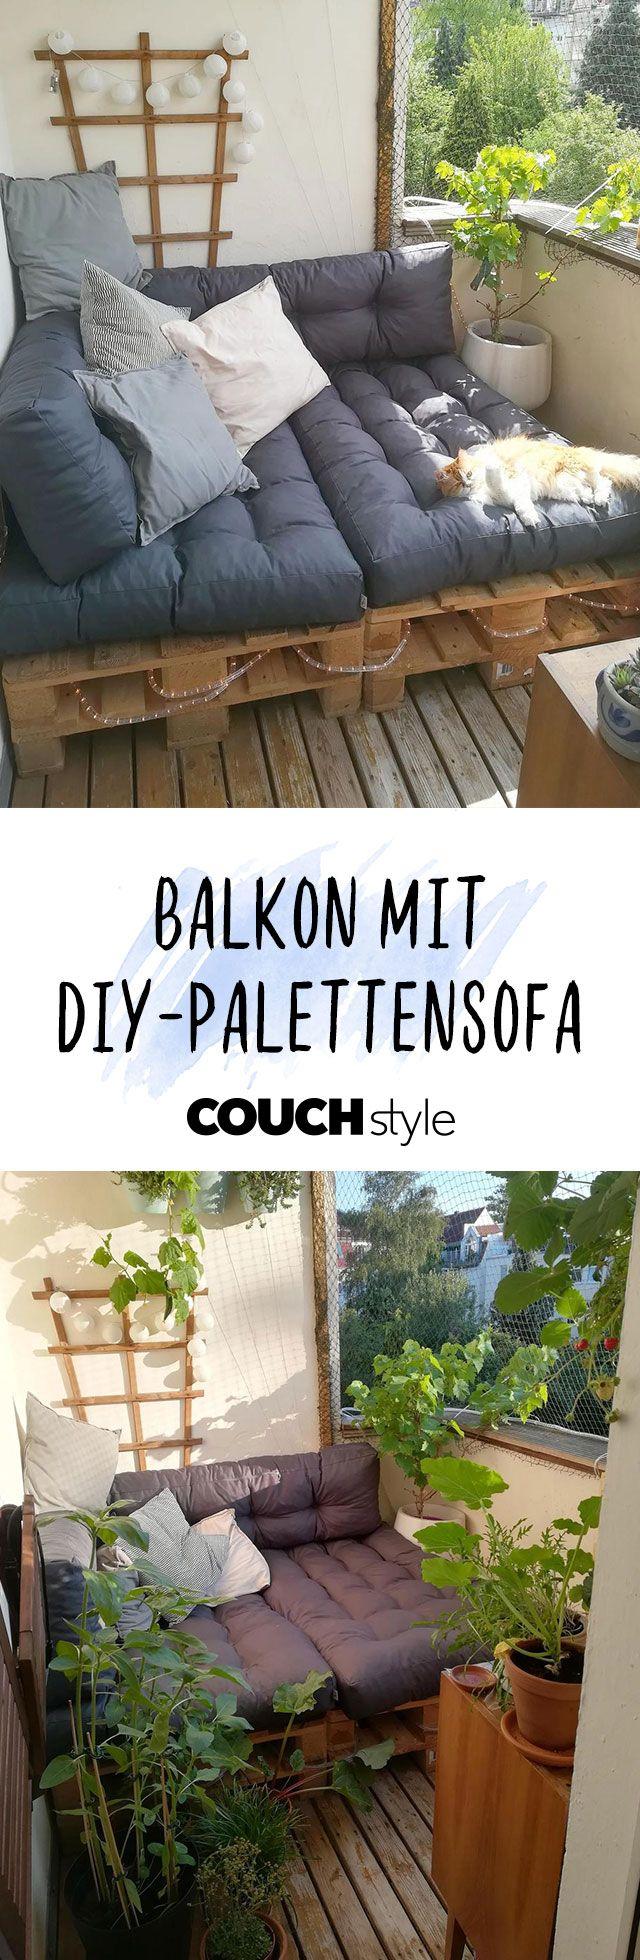 #palettensofa #palettenmöbel #balkon #balkonien #bal…